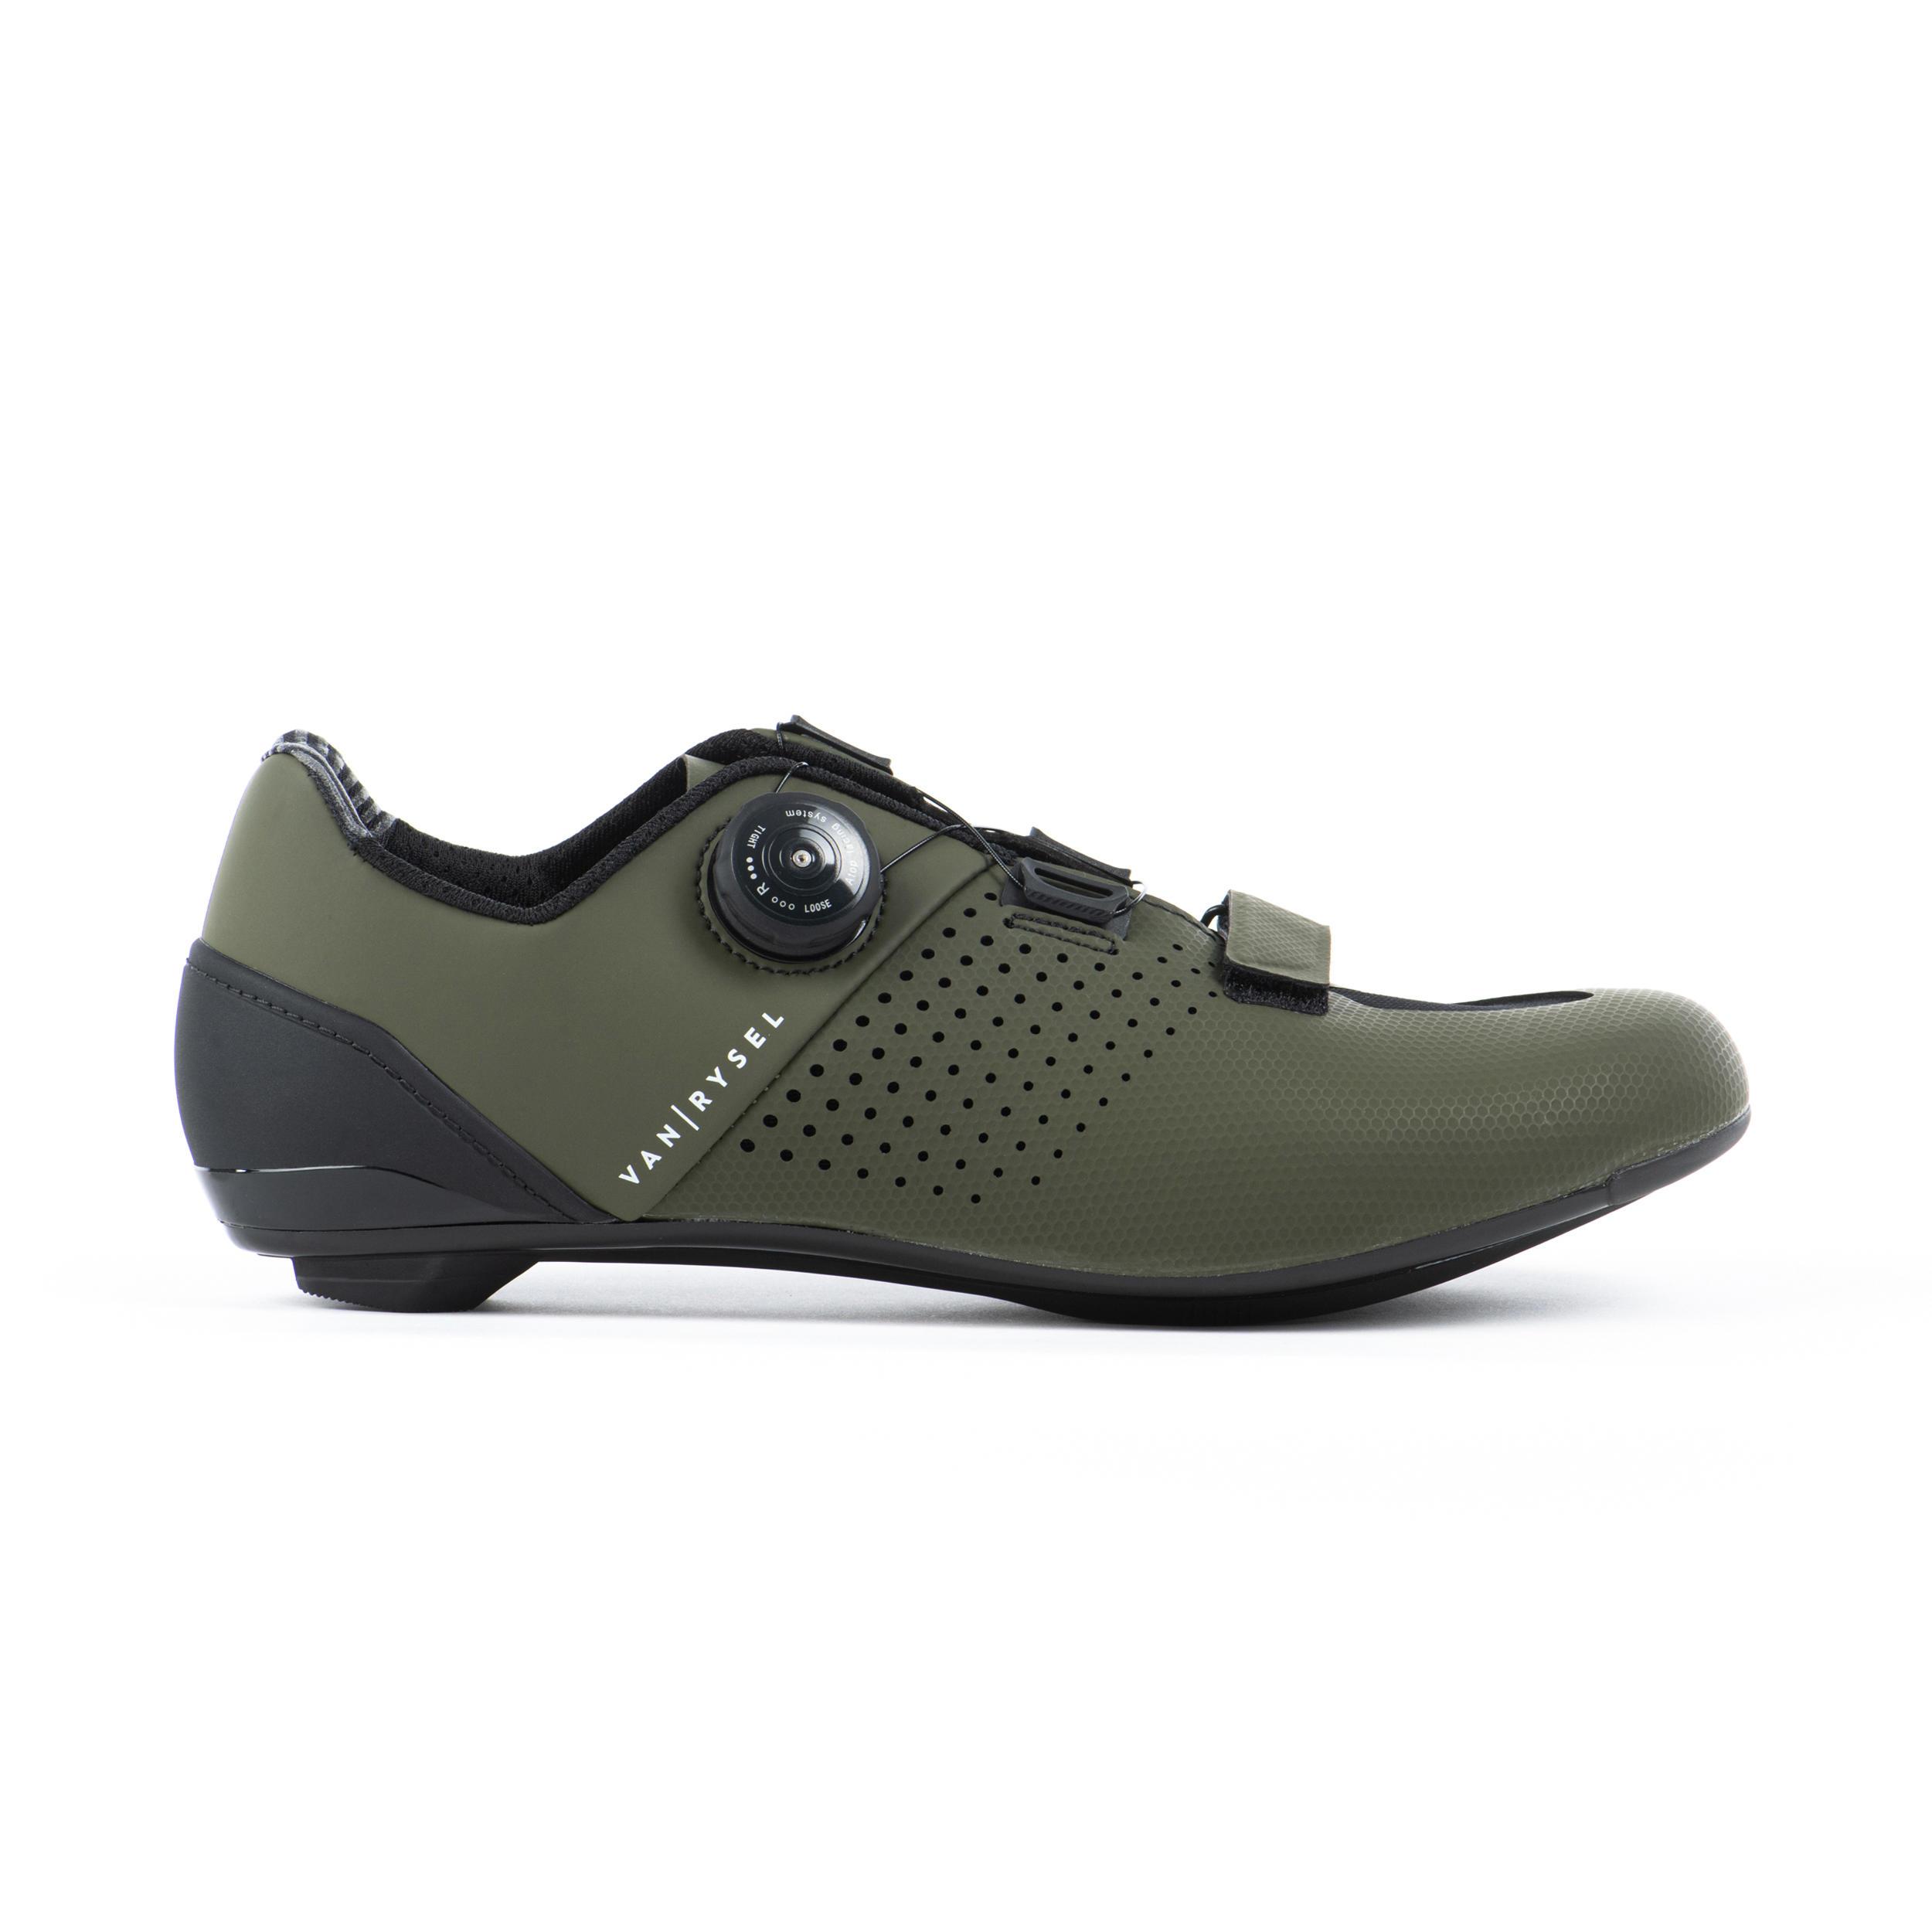 Chaussures de vélo cyclo-sport VAN RYSEL ROADR 520 VAN RYSEL ...